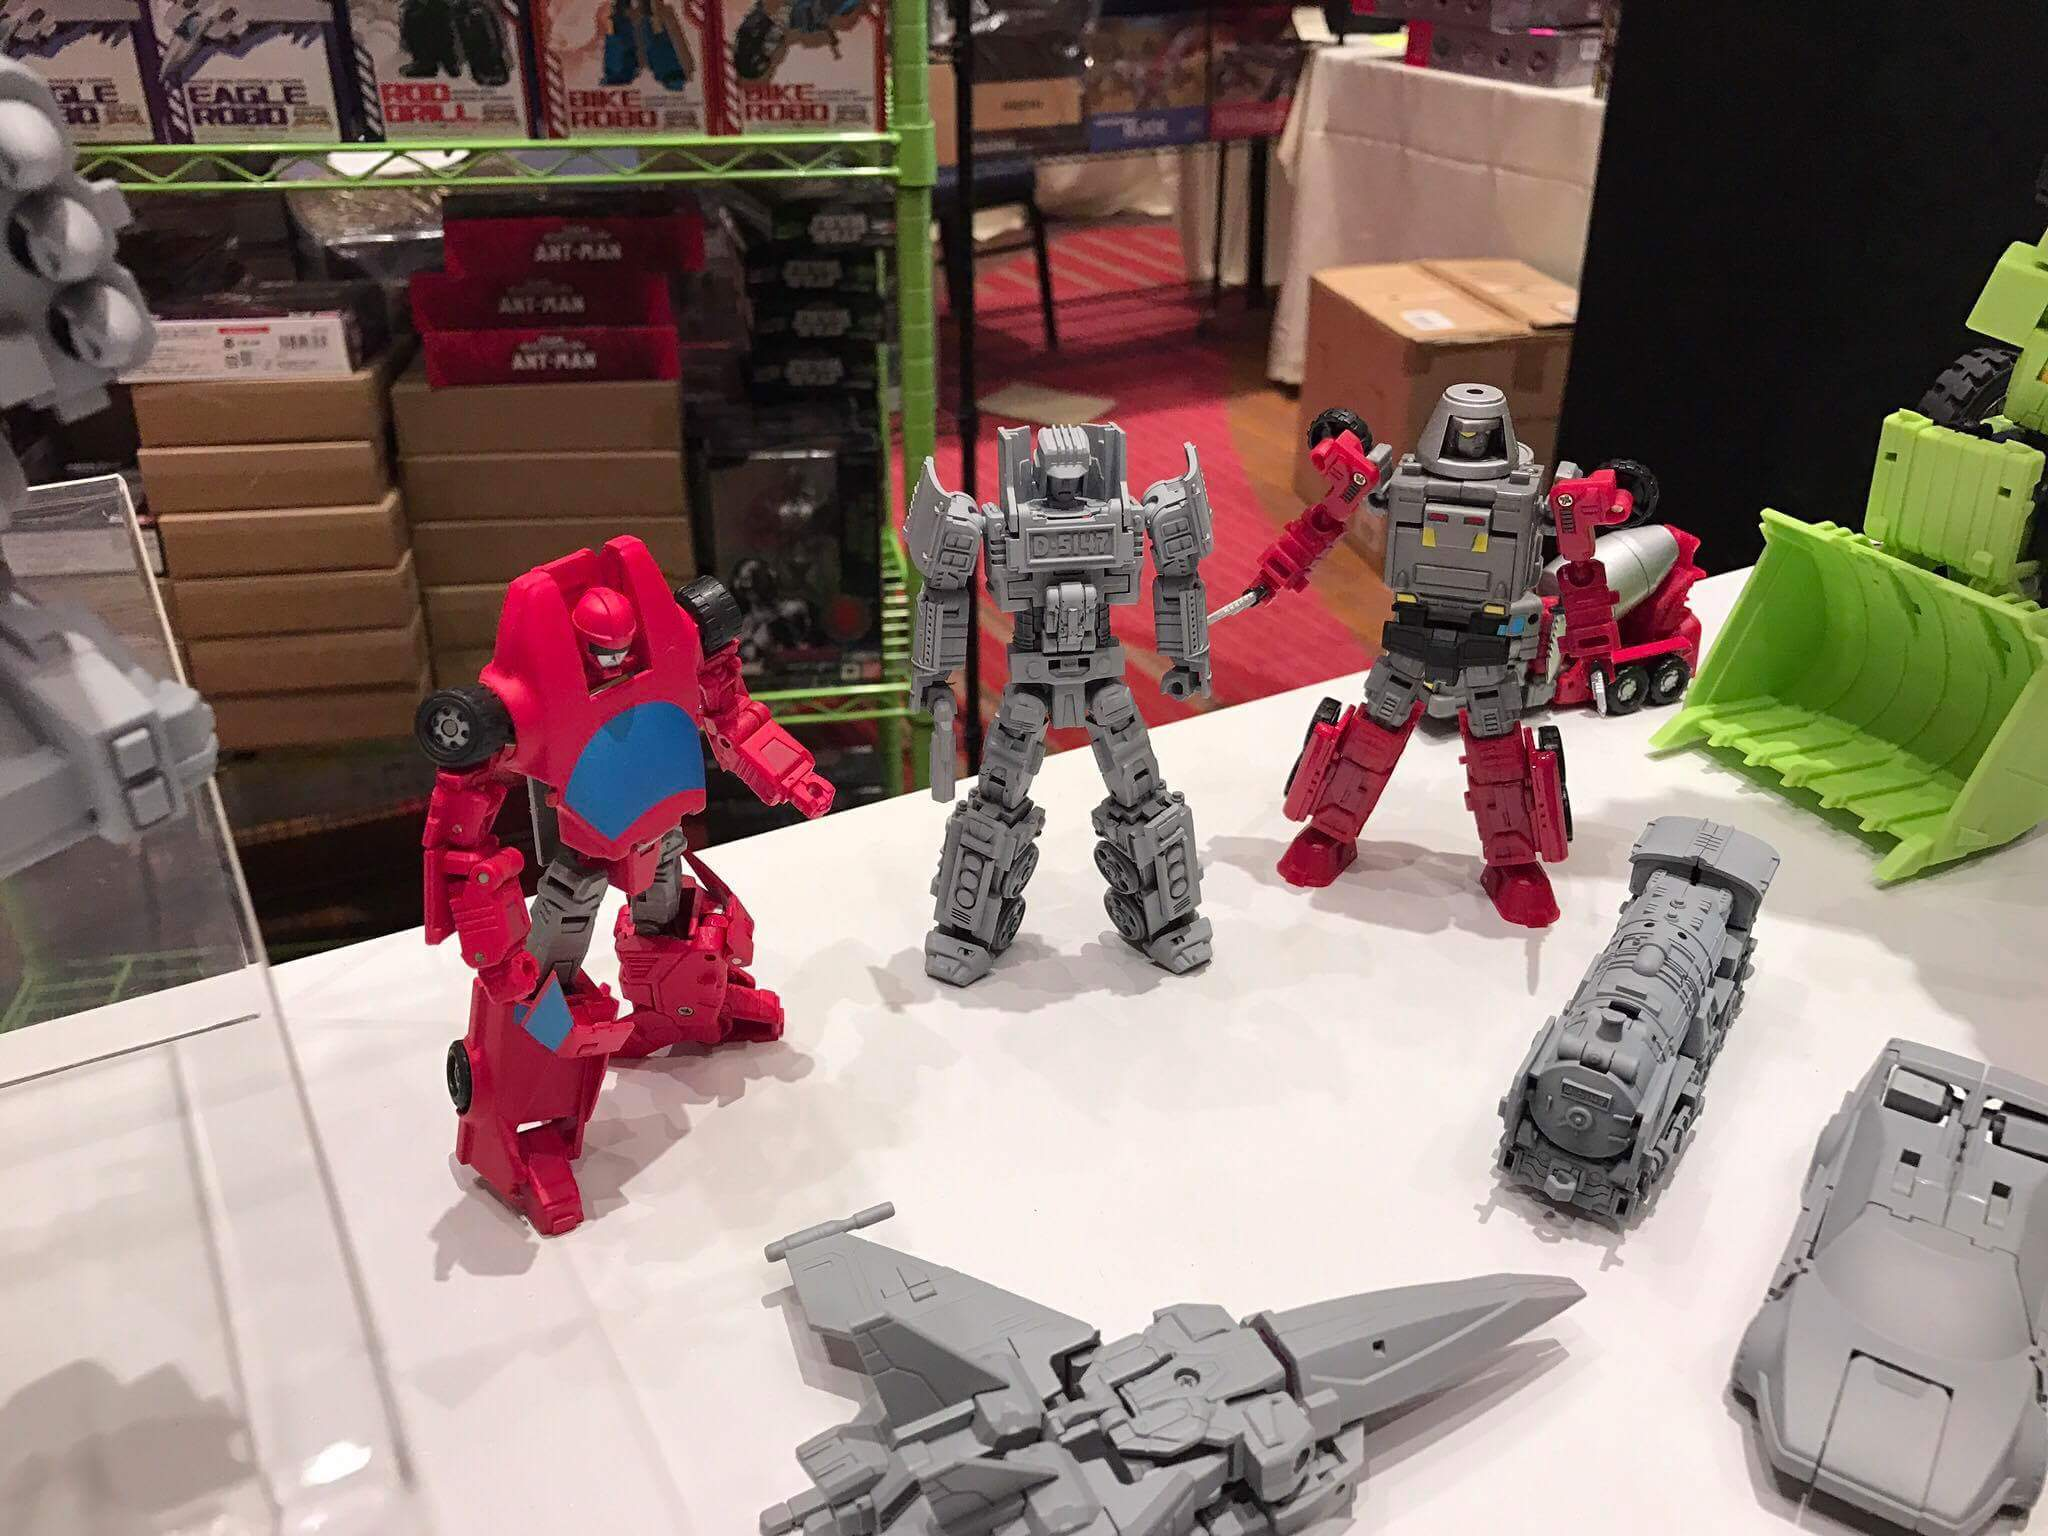 Gobots - Machine Robo ― Dessin Animé + Jouets  - Page 5 NyVAgD4w